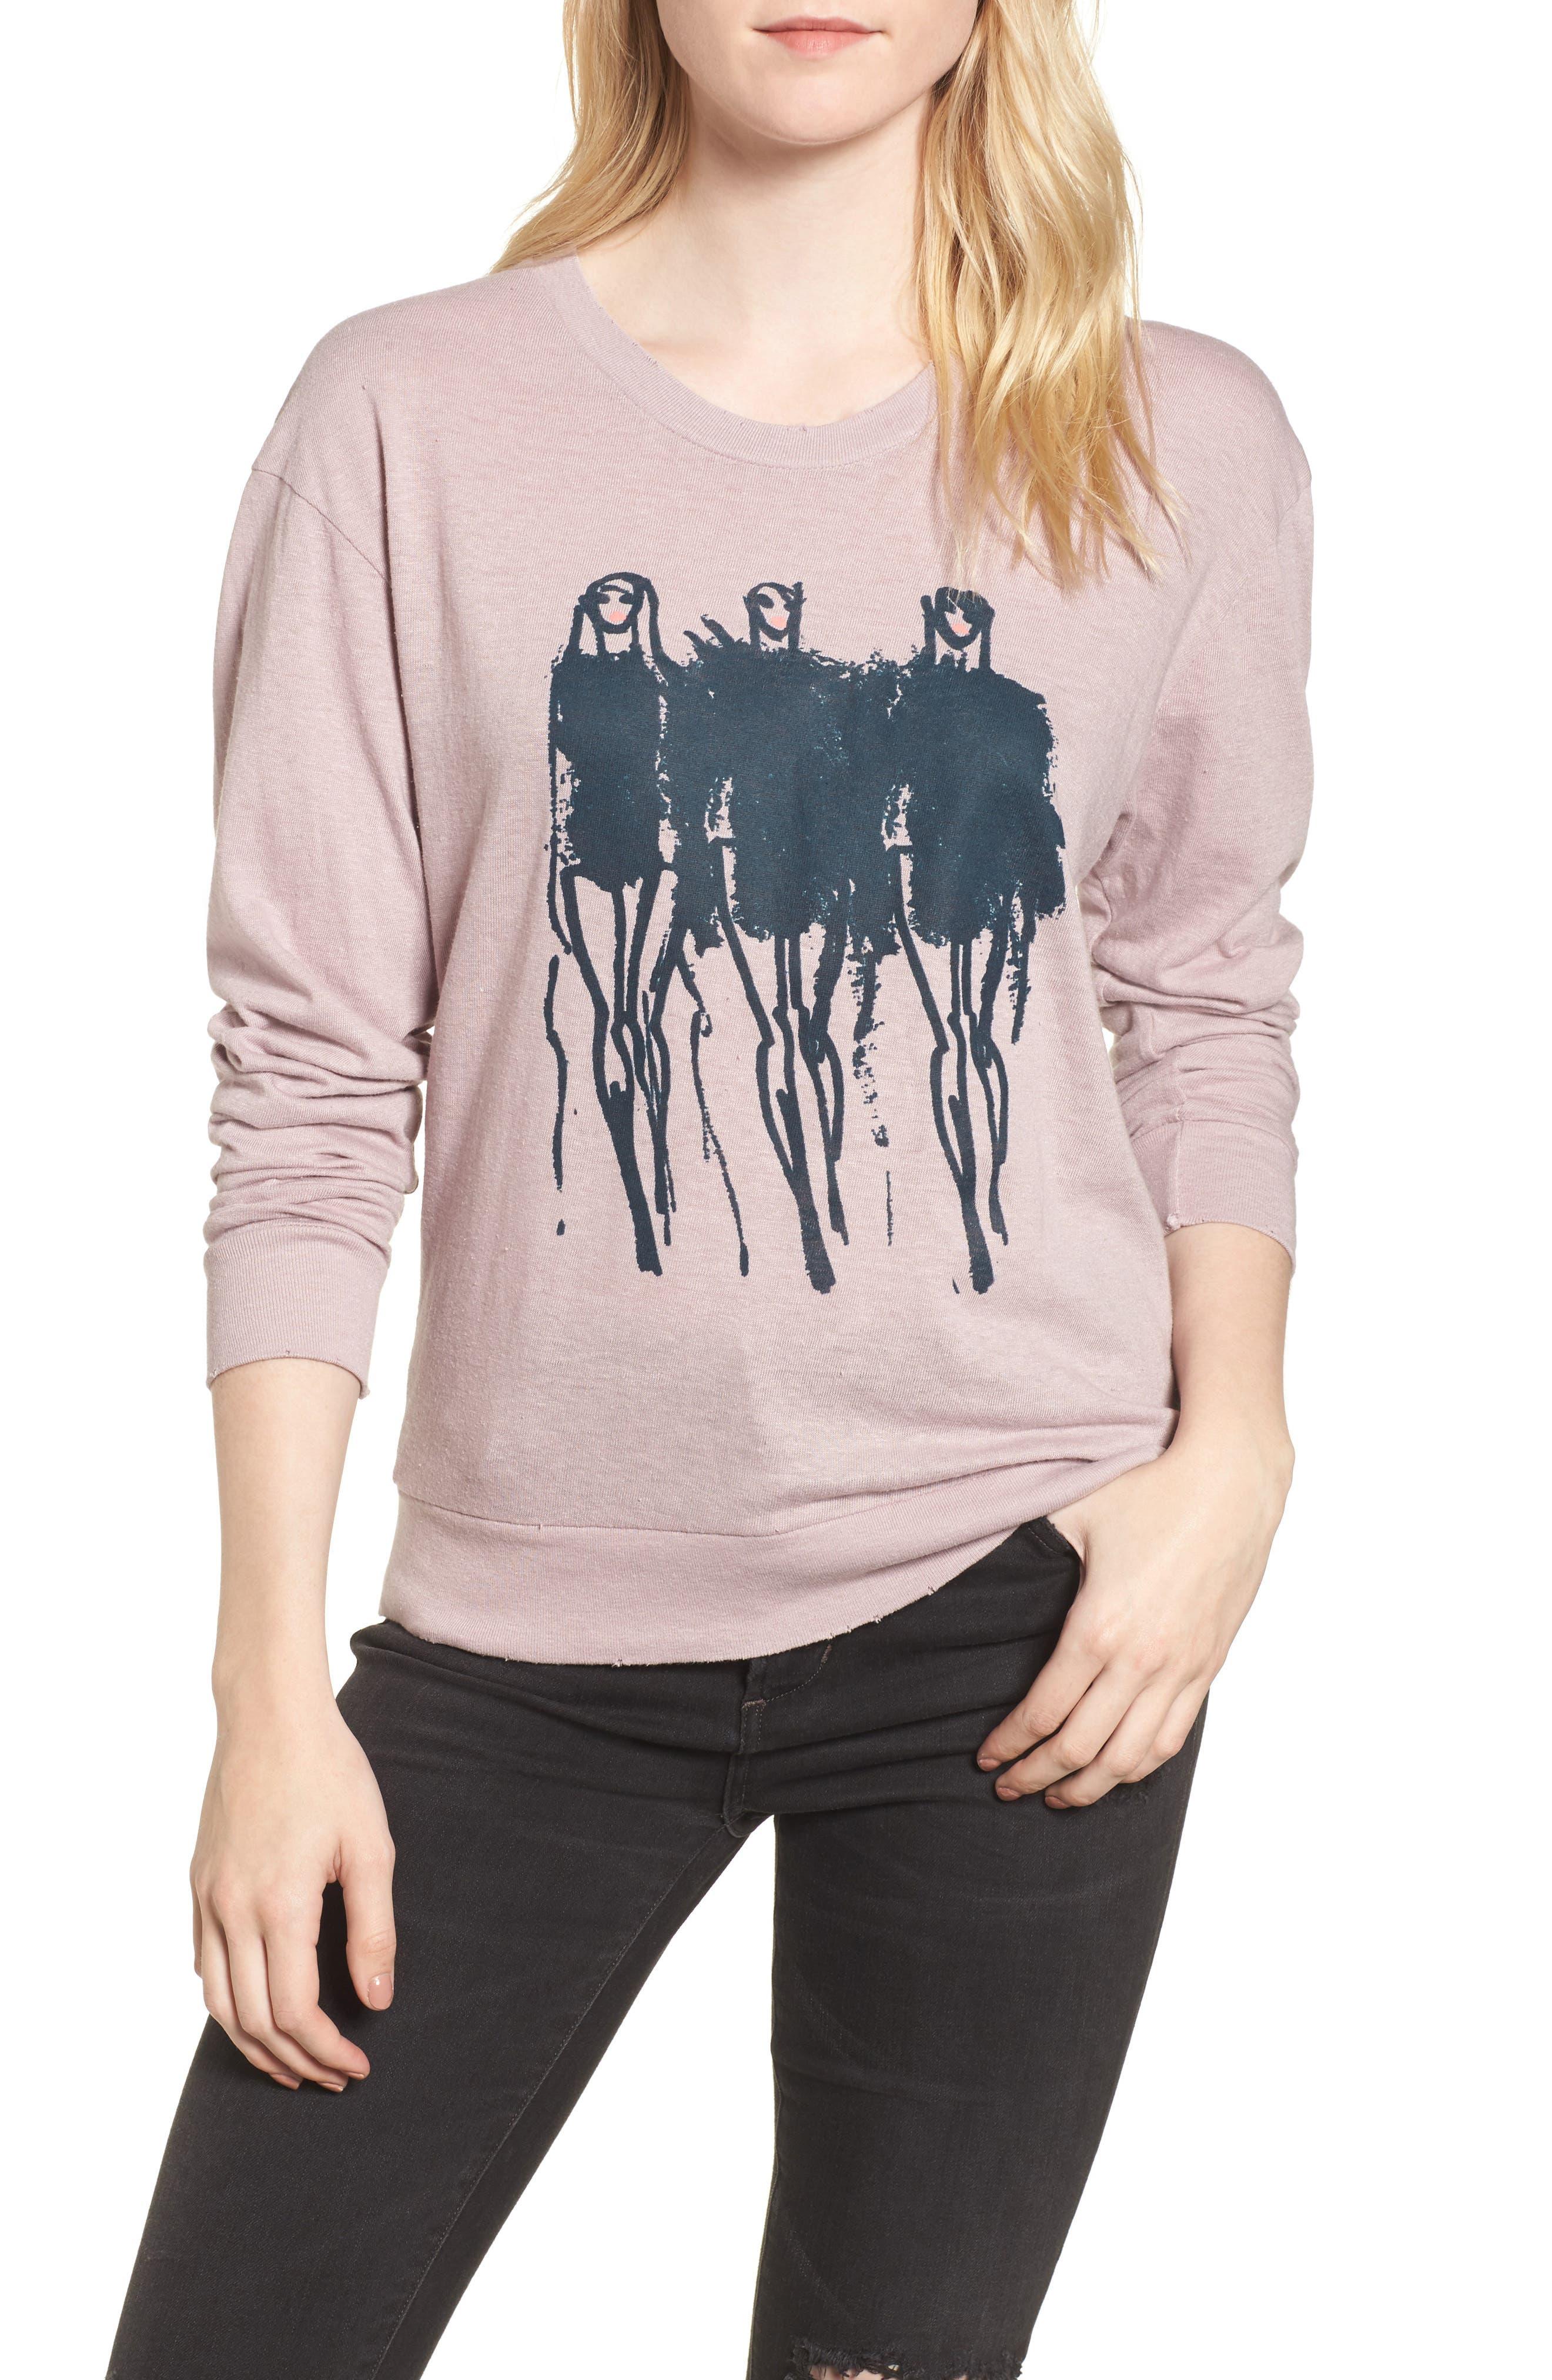 Alternate Image 1 Selected - Junk Food x Donald Robertson Black Dresses Sweatshirt